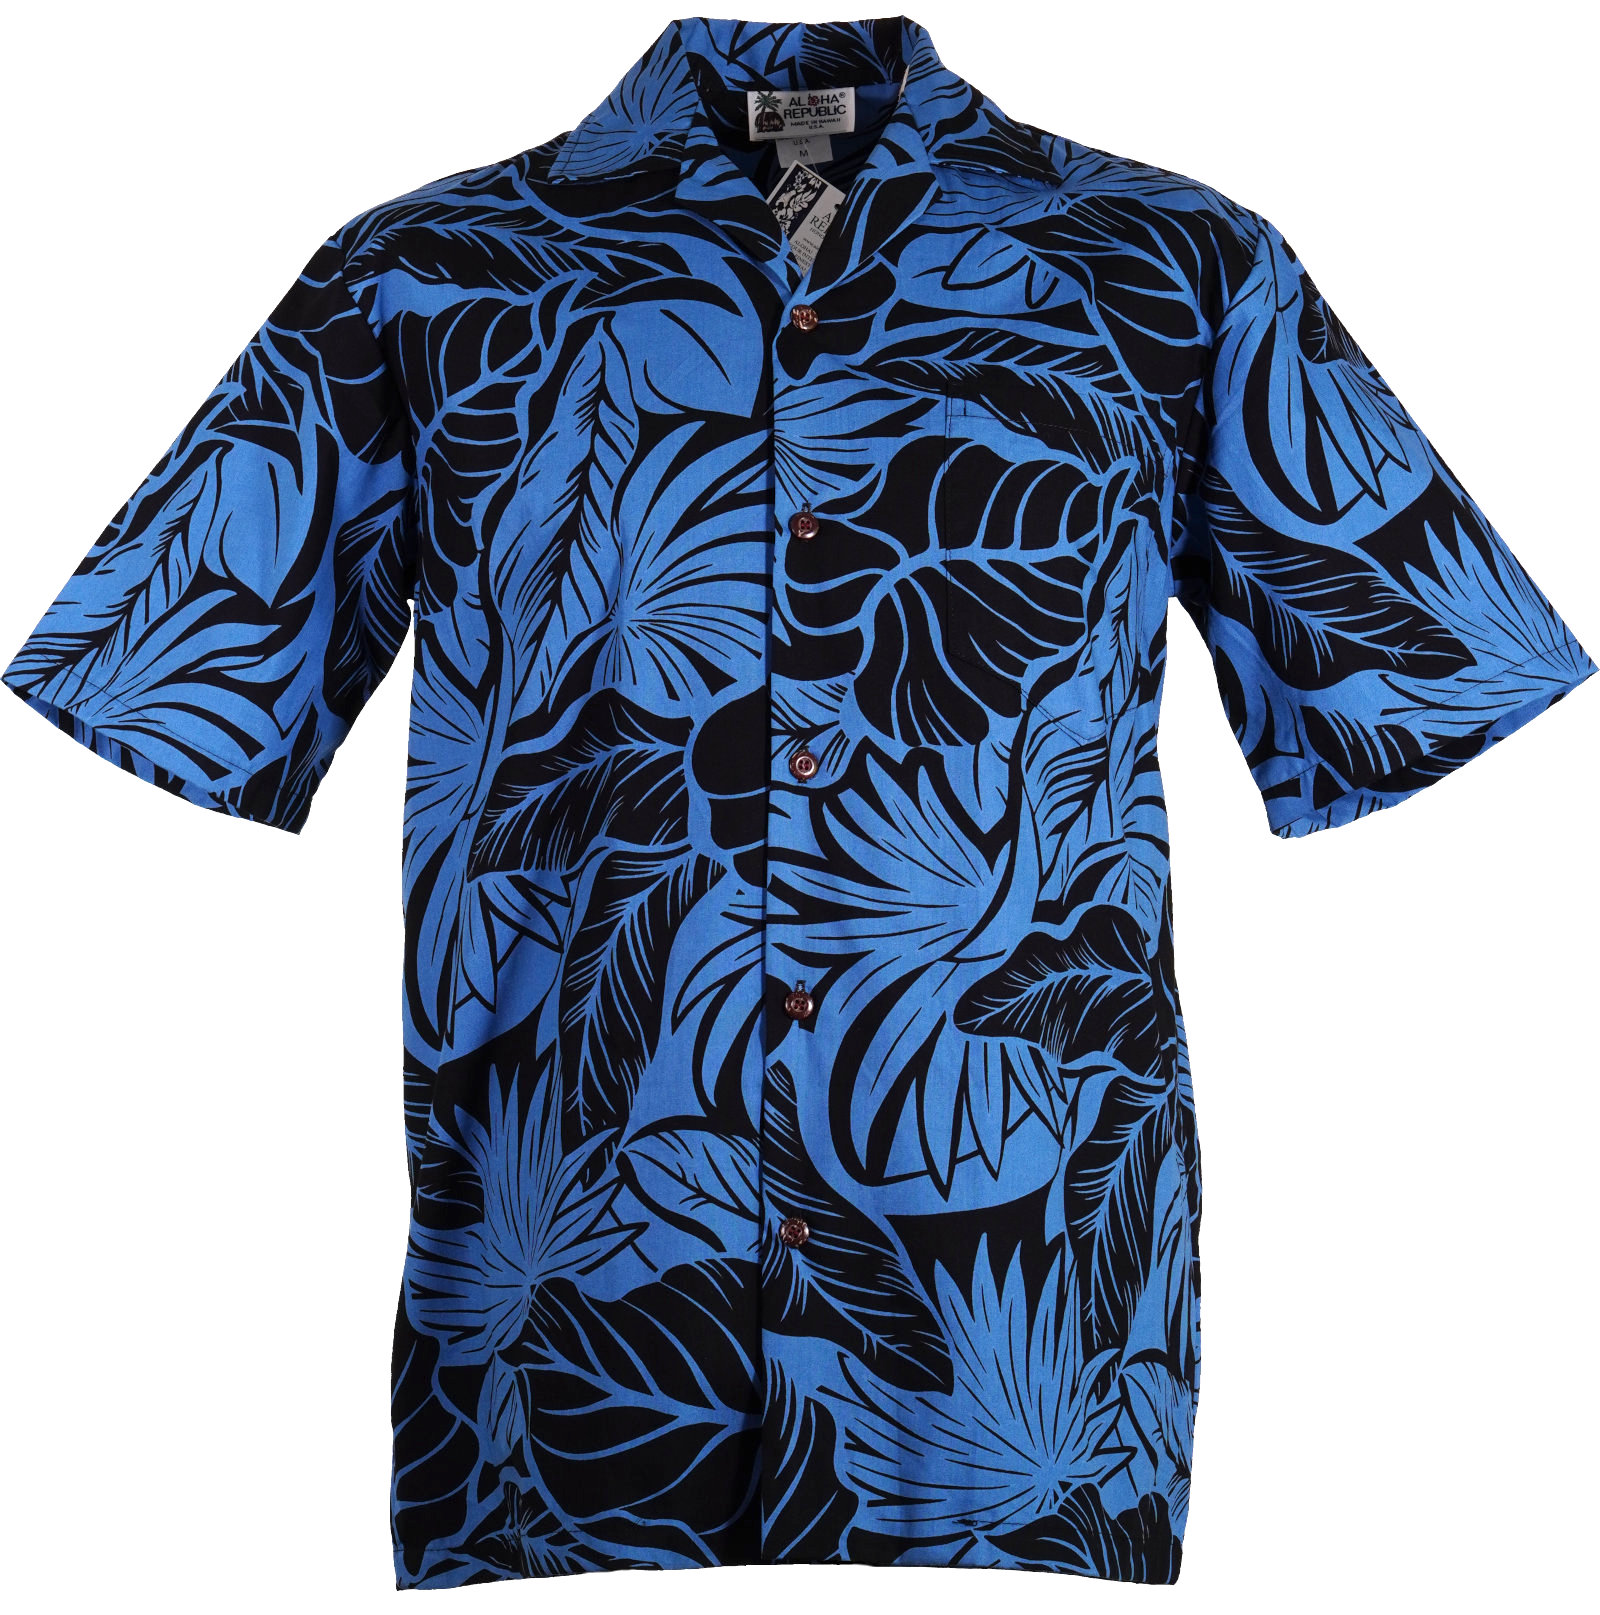 Original Hawaiihemd -Shadow of the Monstera-